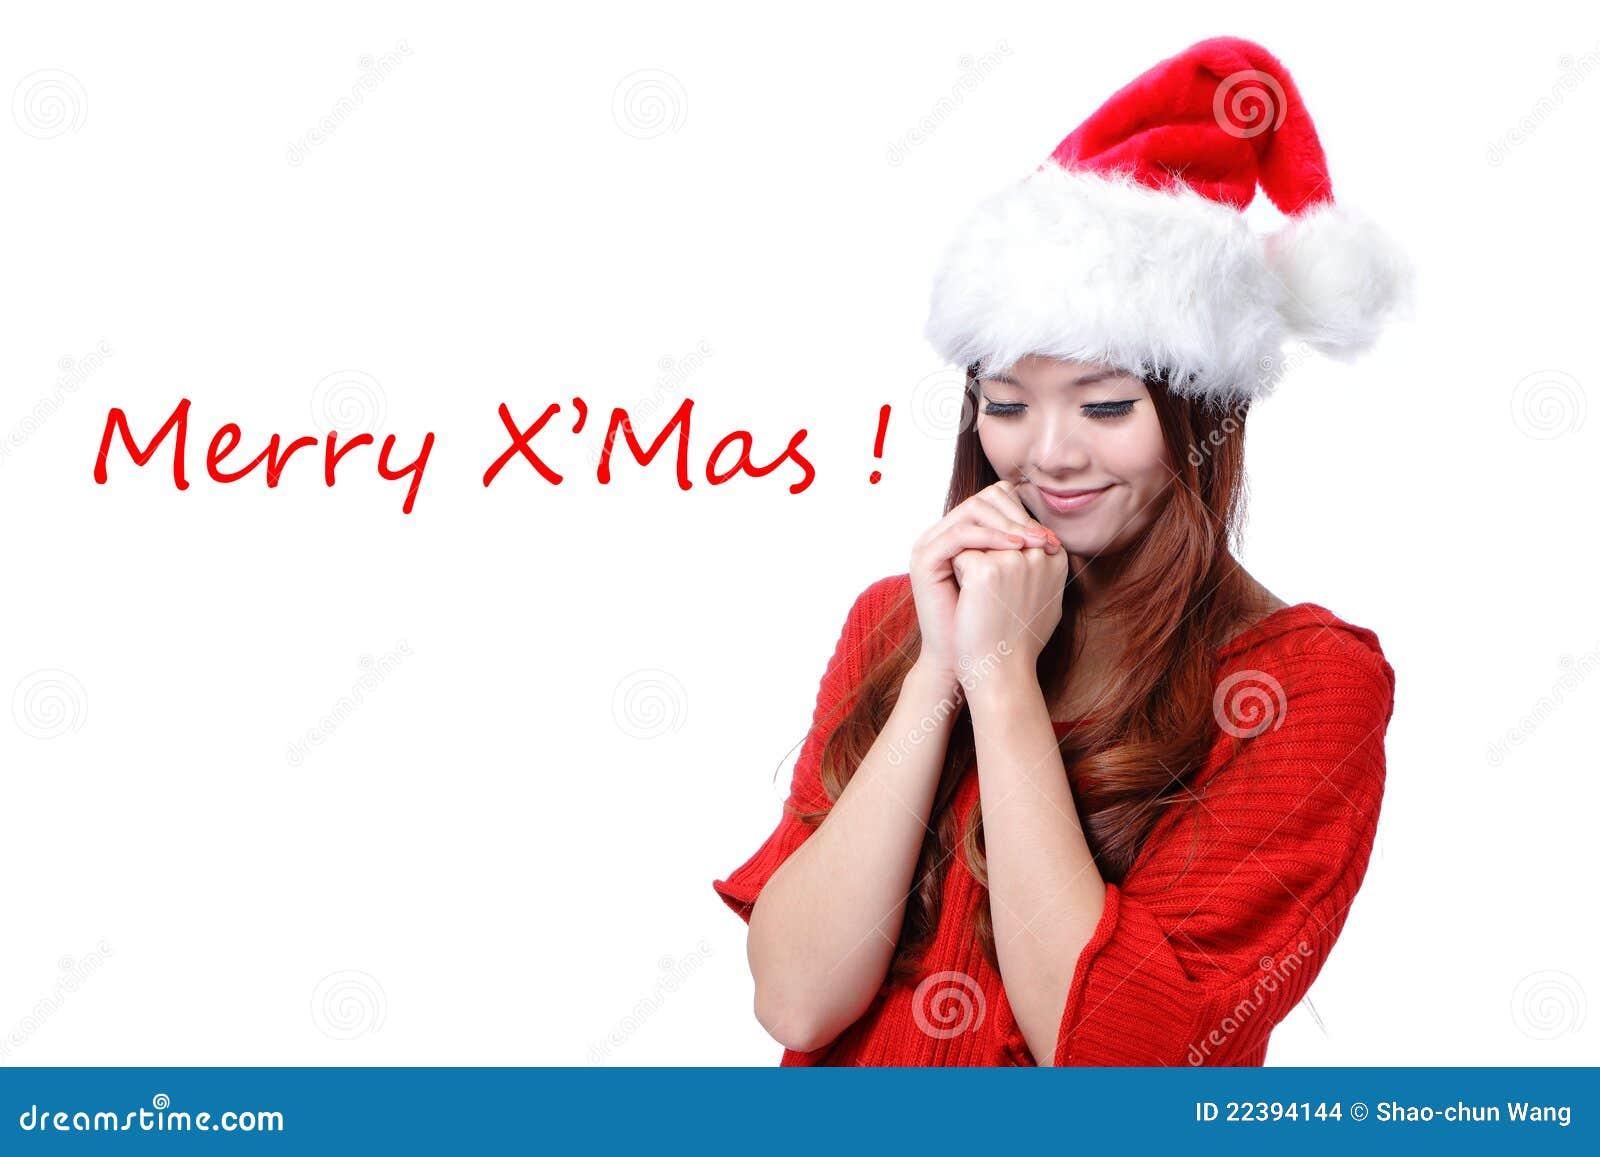 beauty merry christmas - photo #29